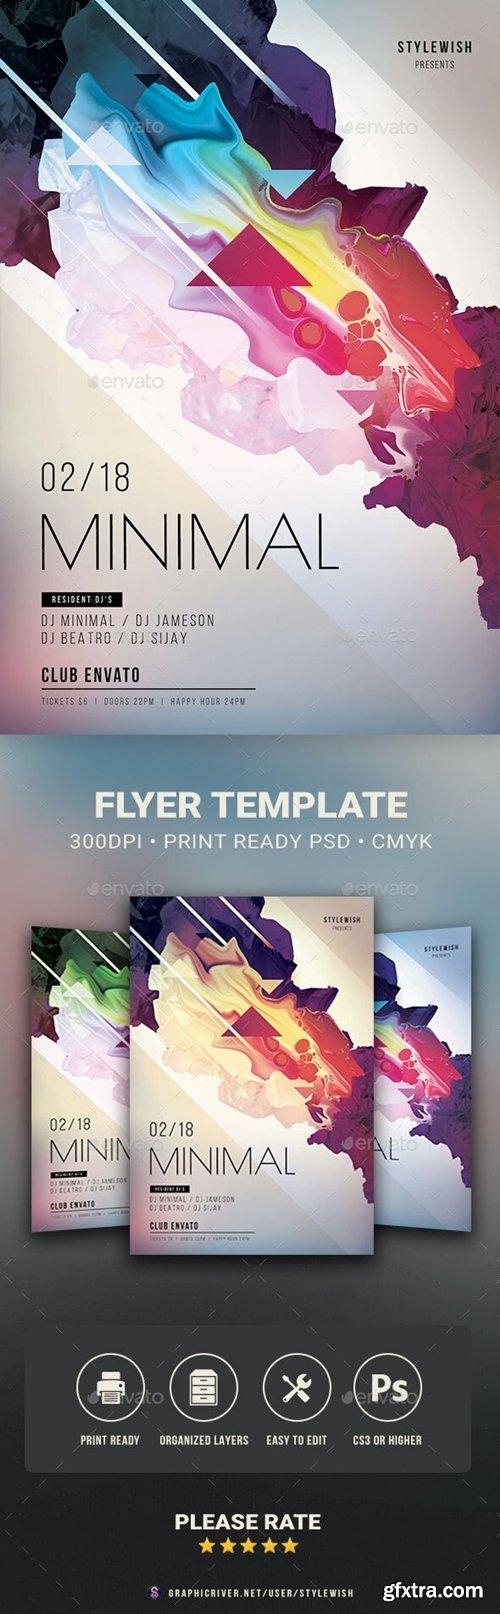 GraphicRiver - Minimal Flyer 32229992